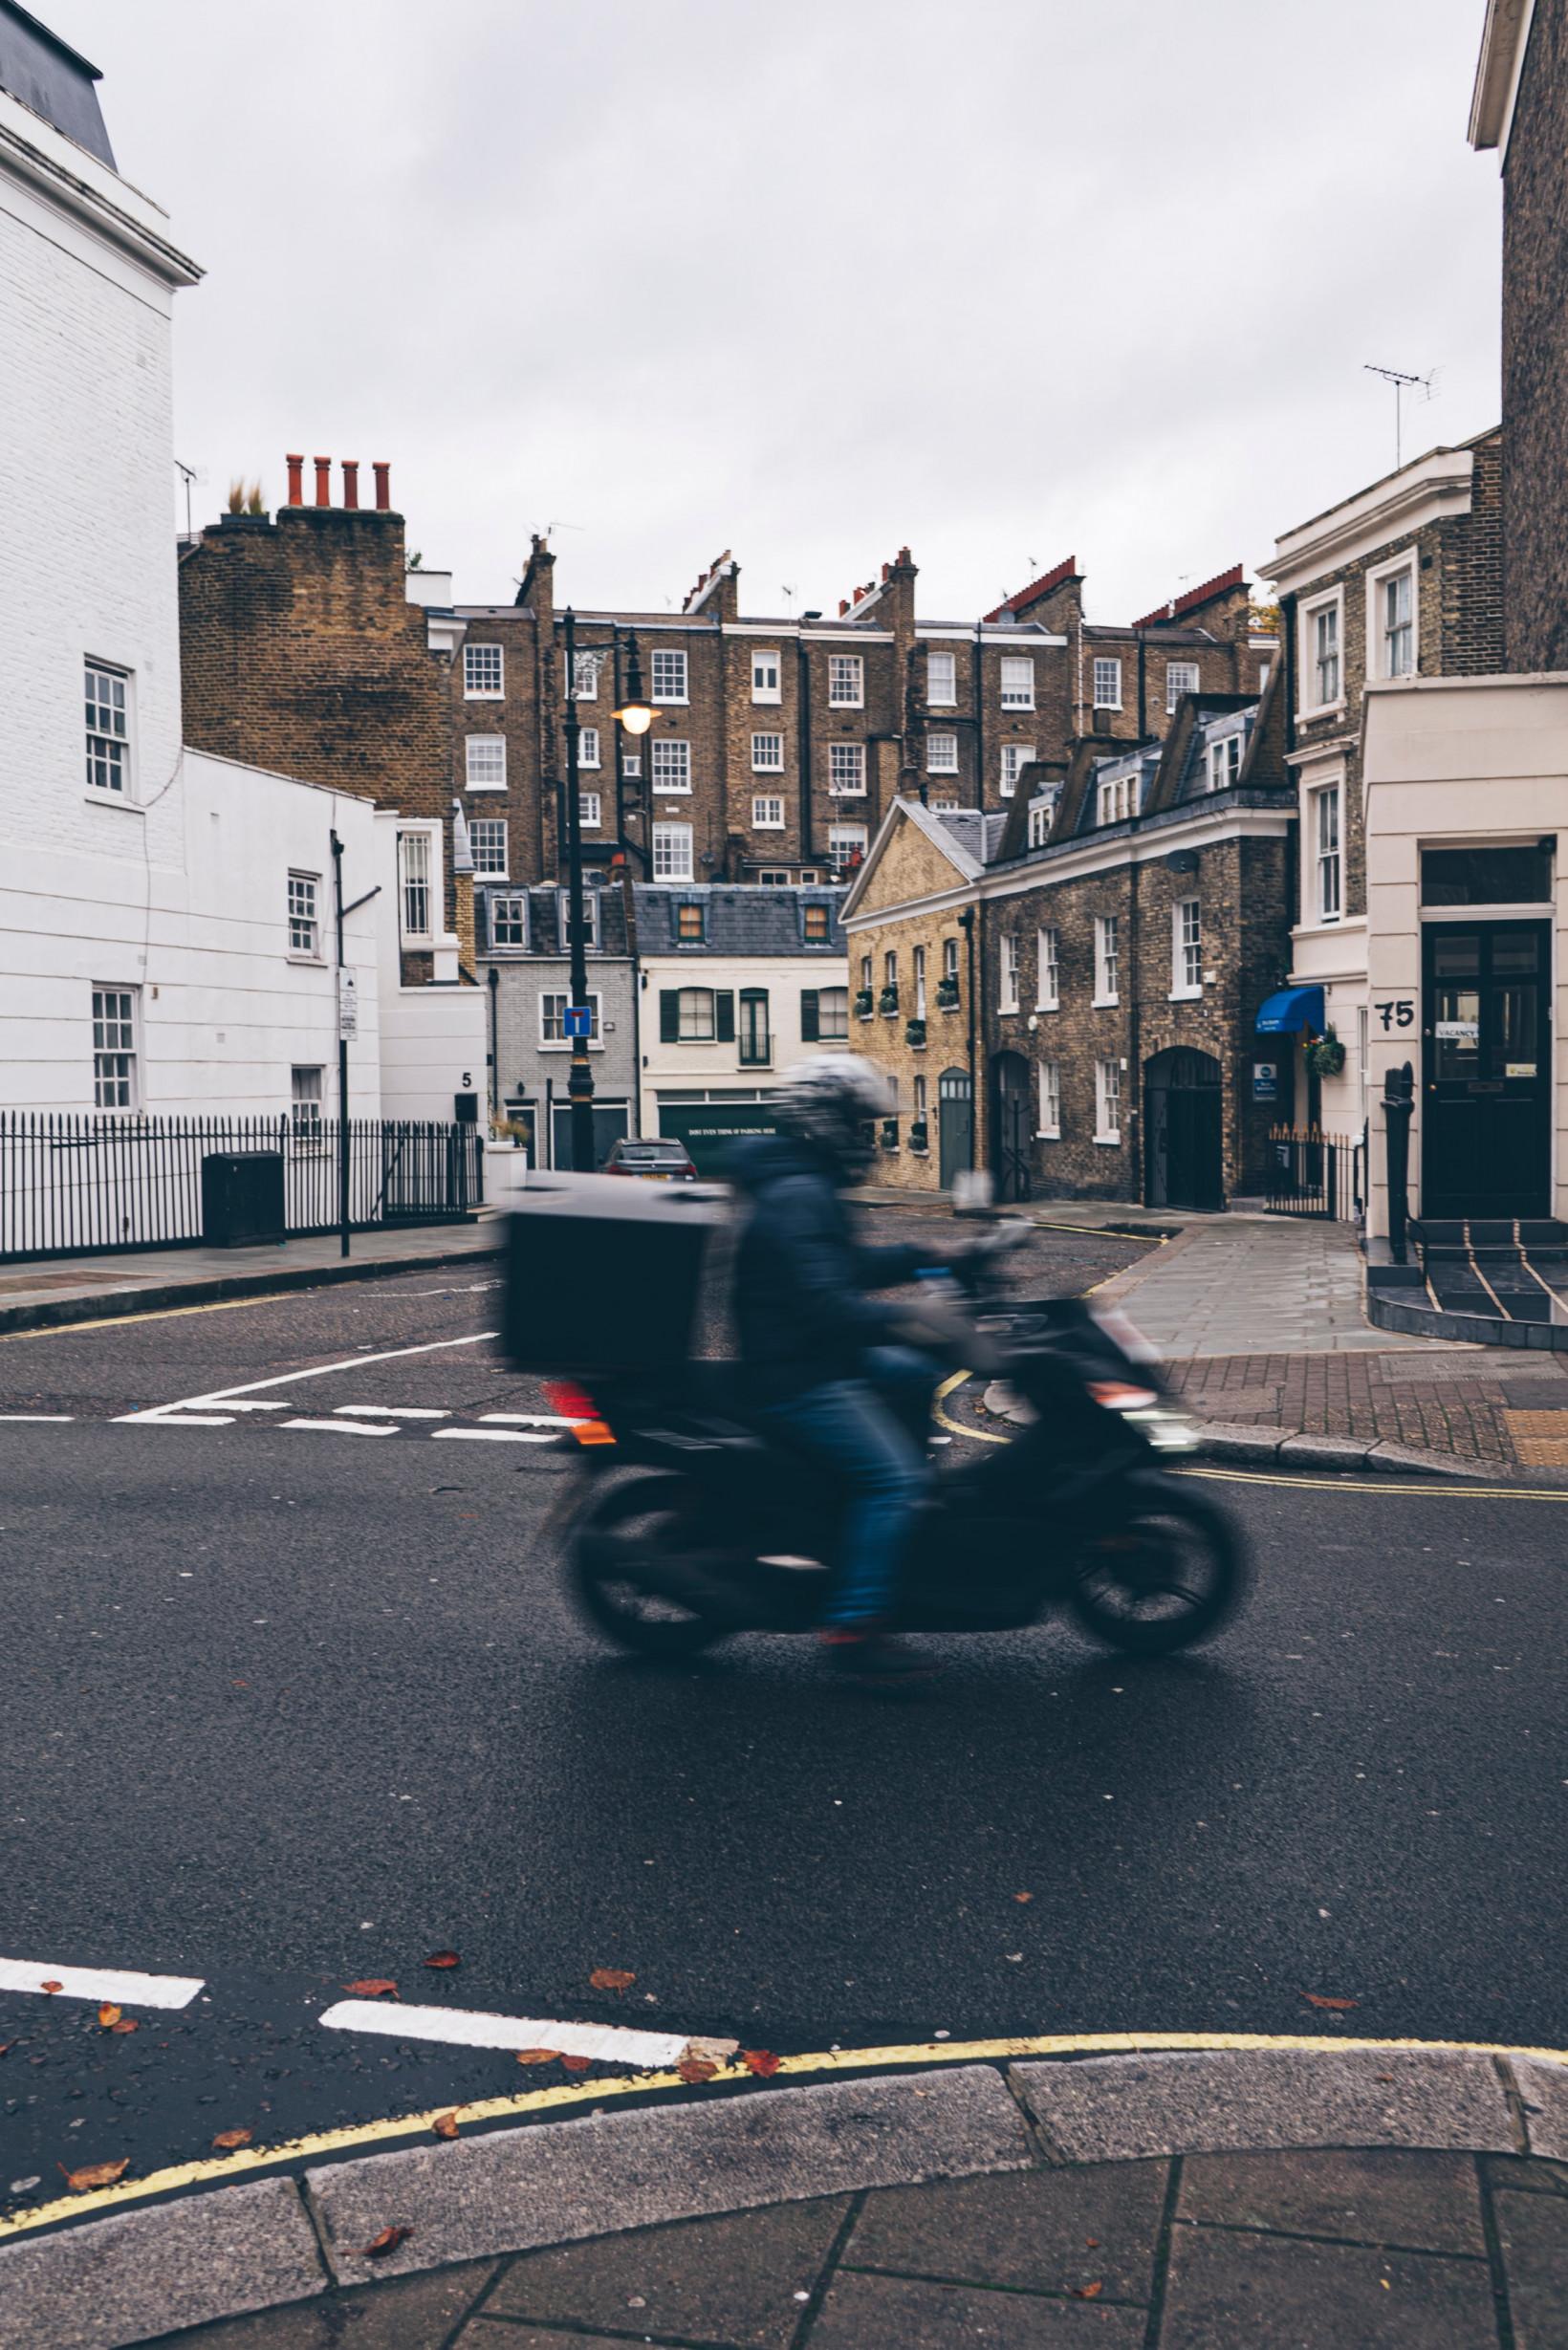 scooter, london, uk, autotrader